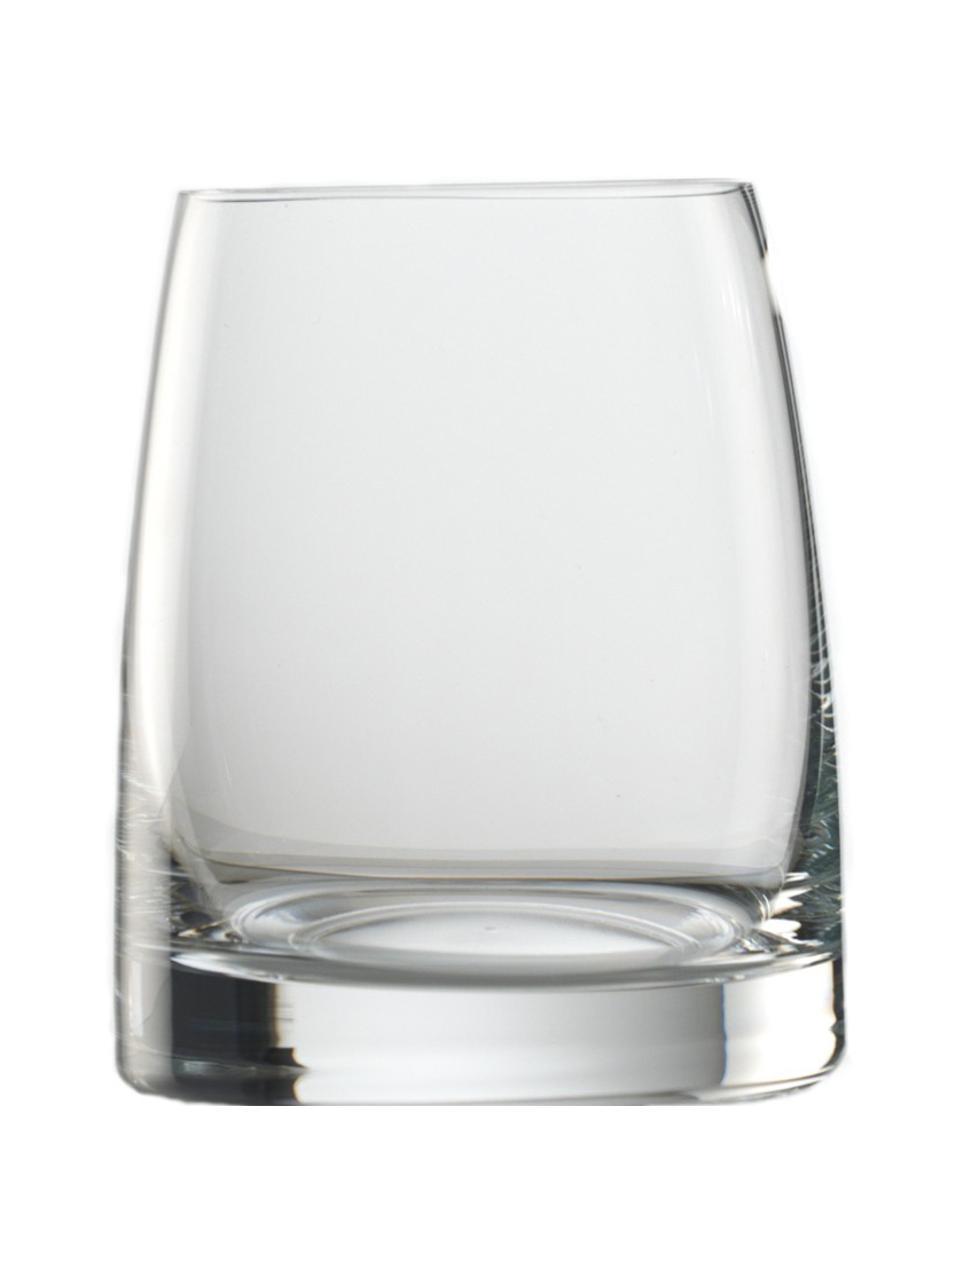 Kristallgläser Experience, 6 Stück, Kristallglas, Transparent, Ø 8 x H 9 cm